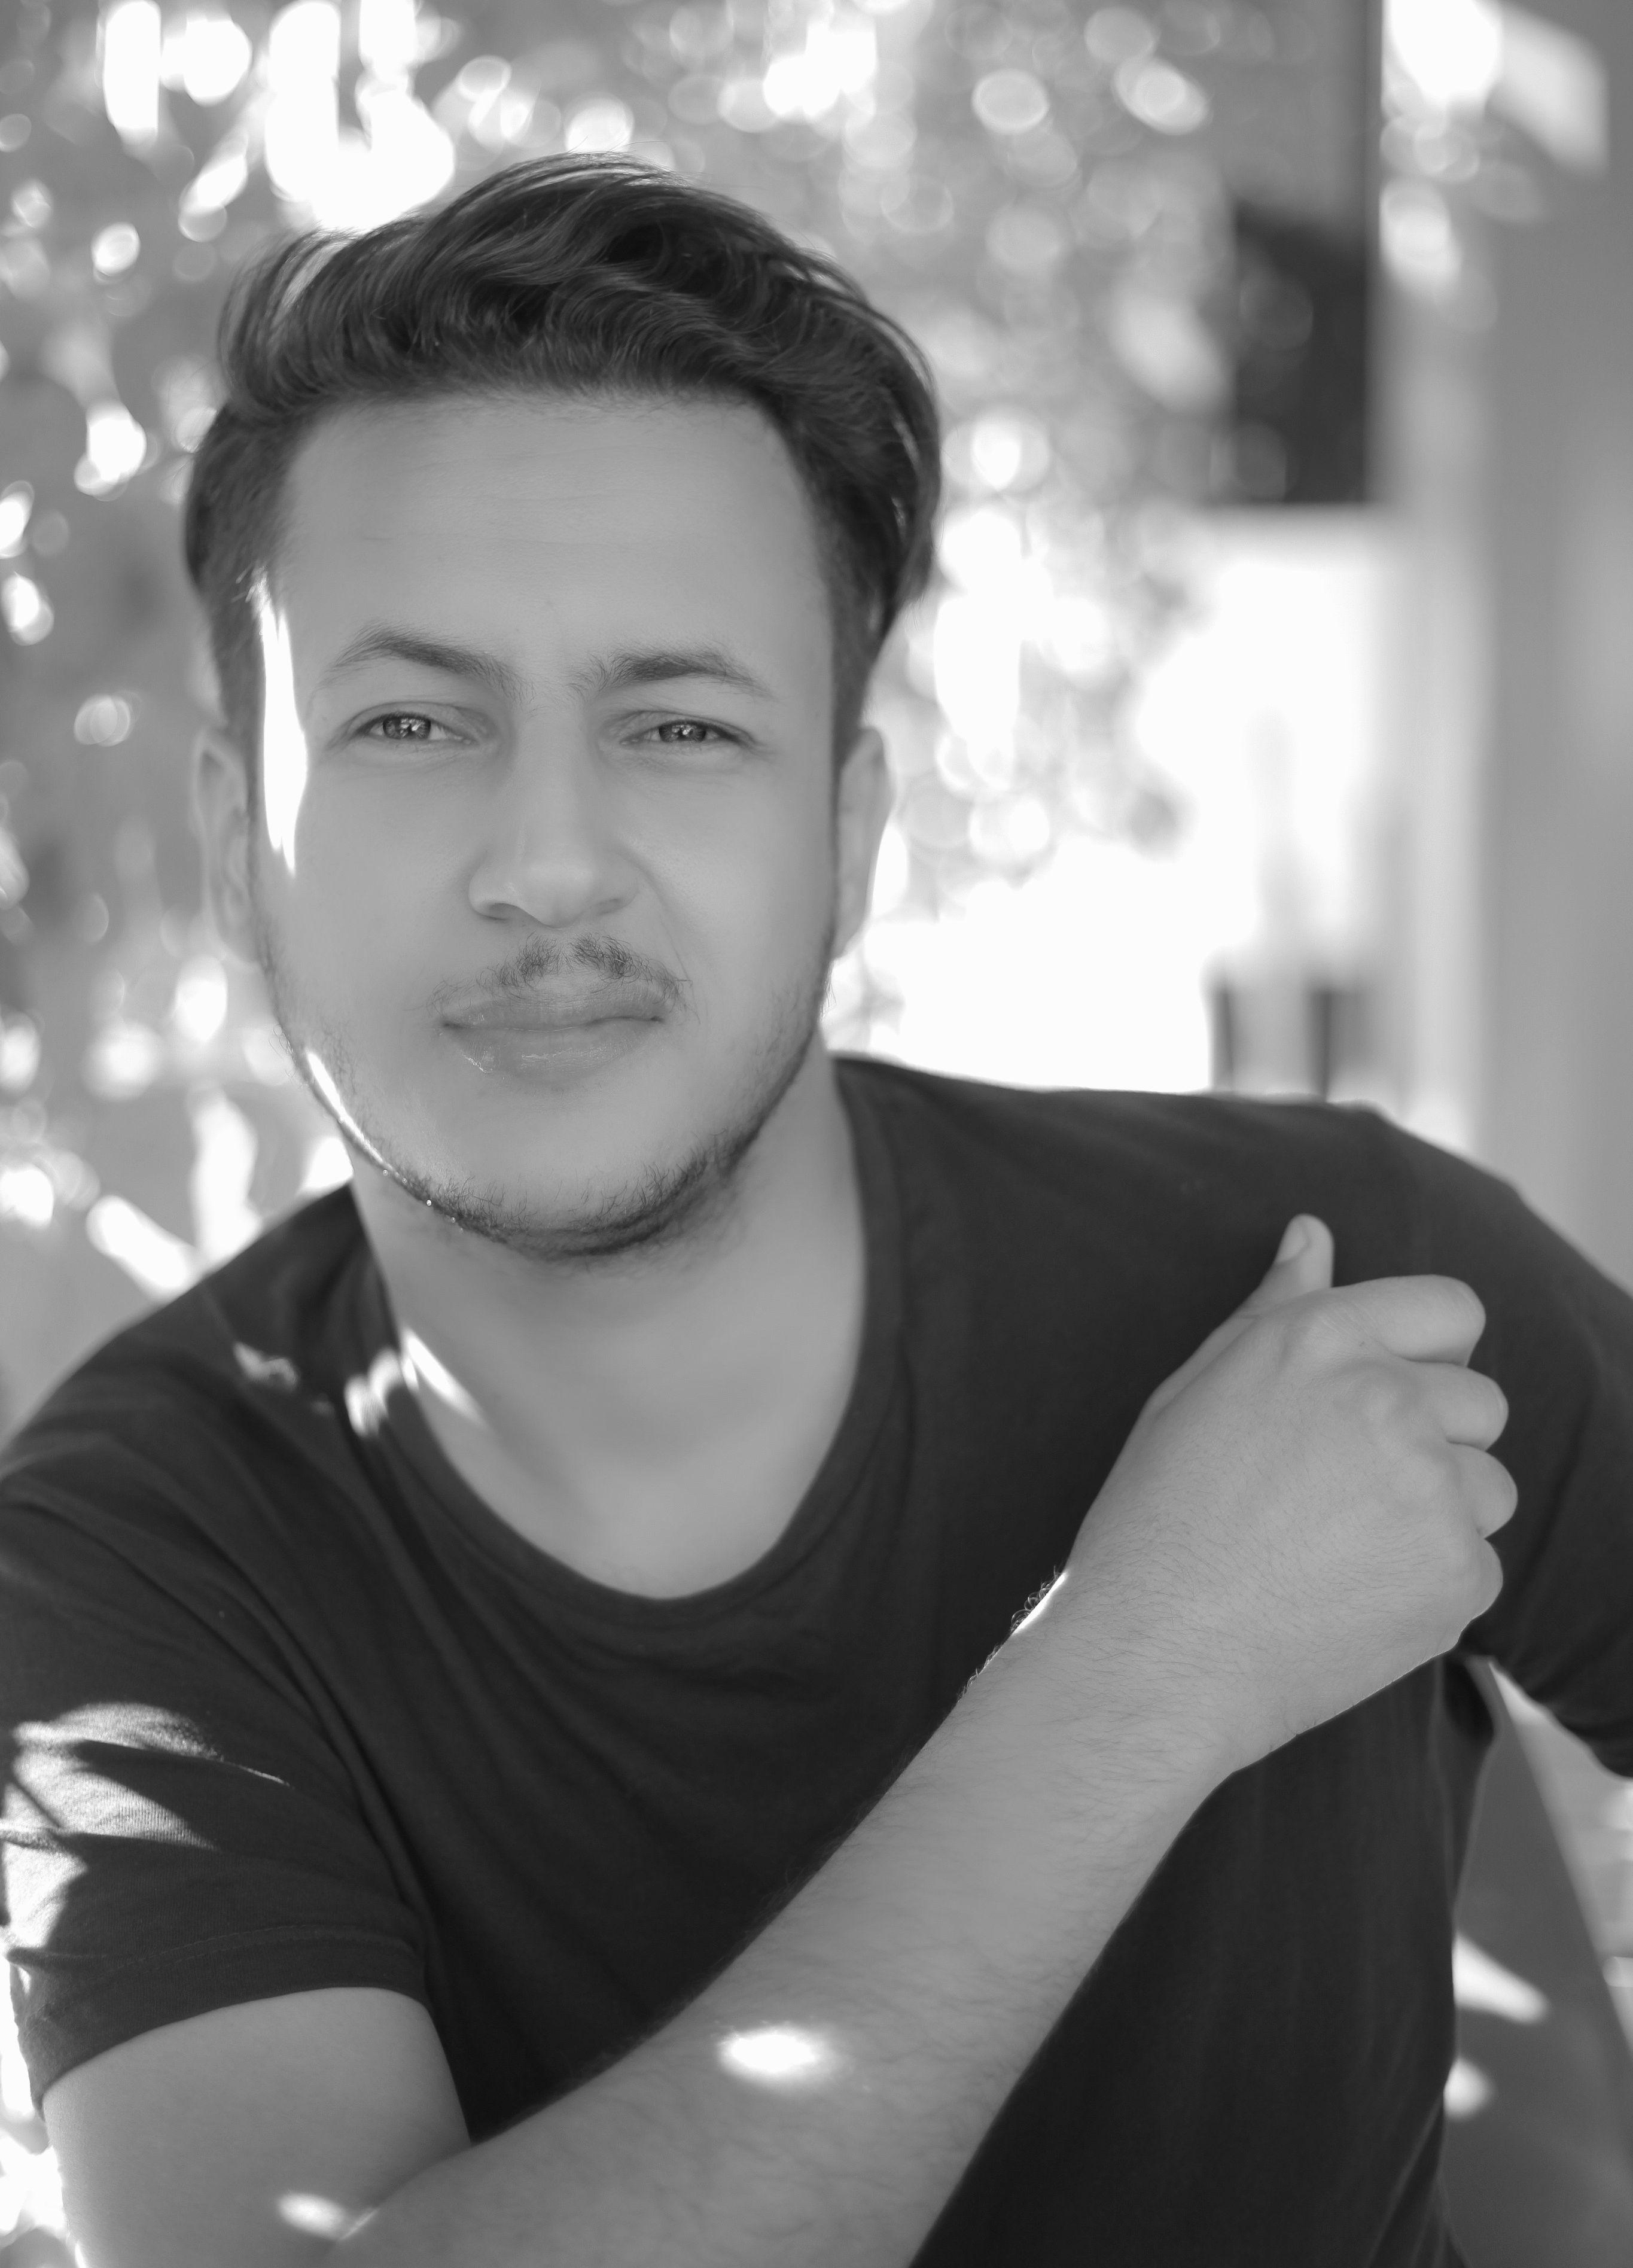 هشام بن شريف Headshot